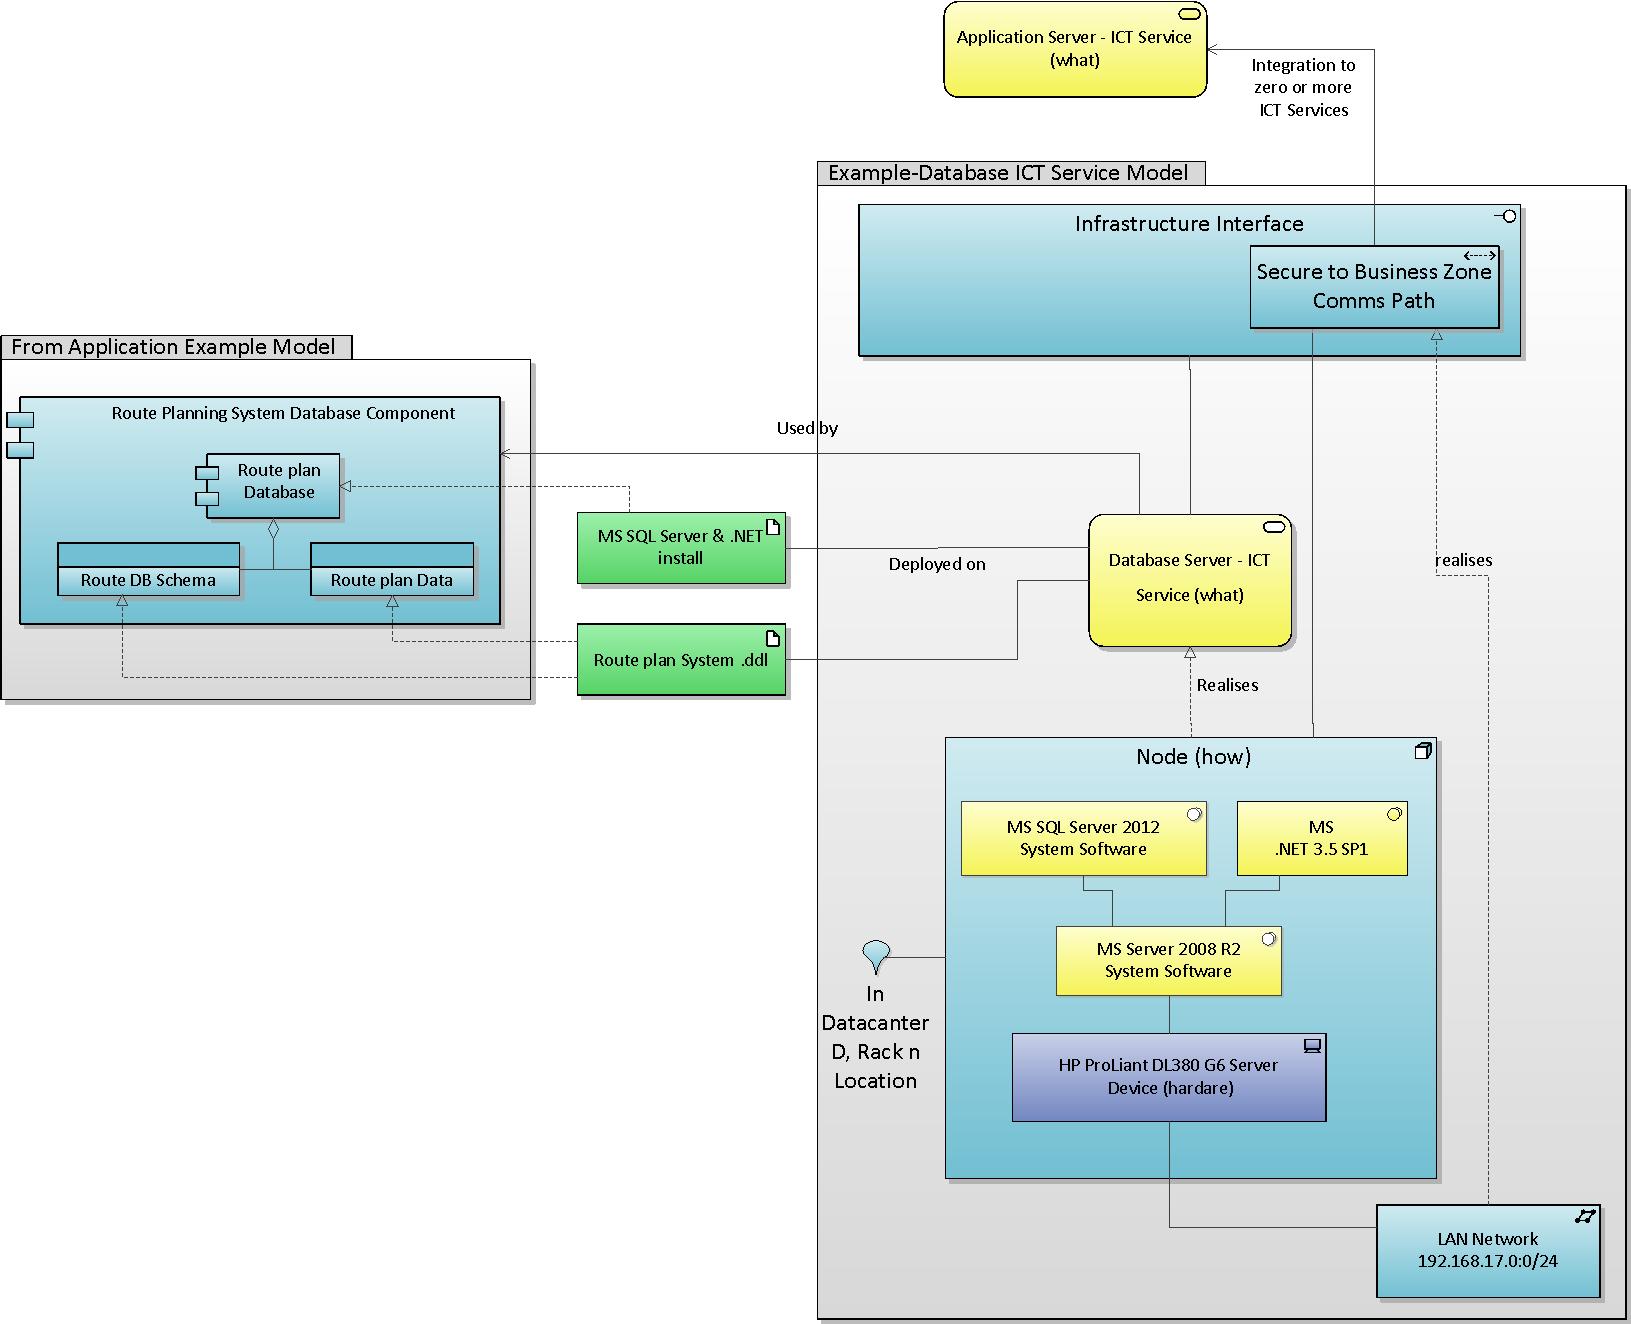 ICT Services Model